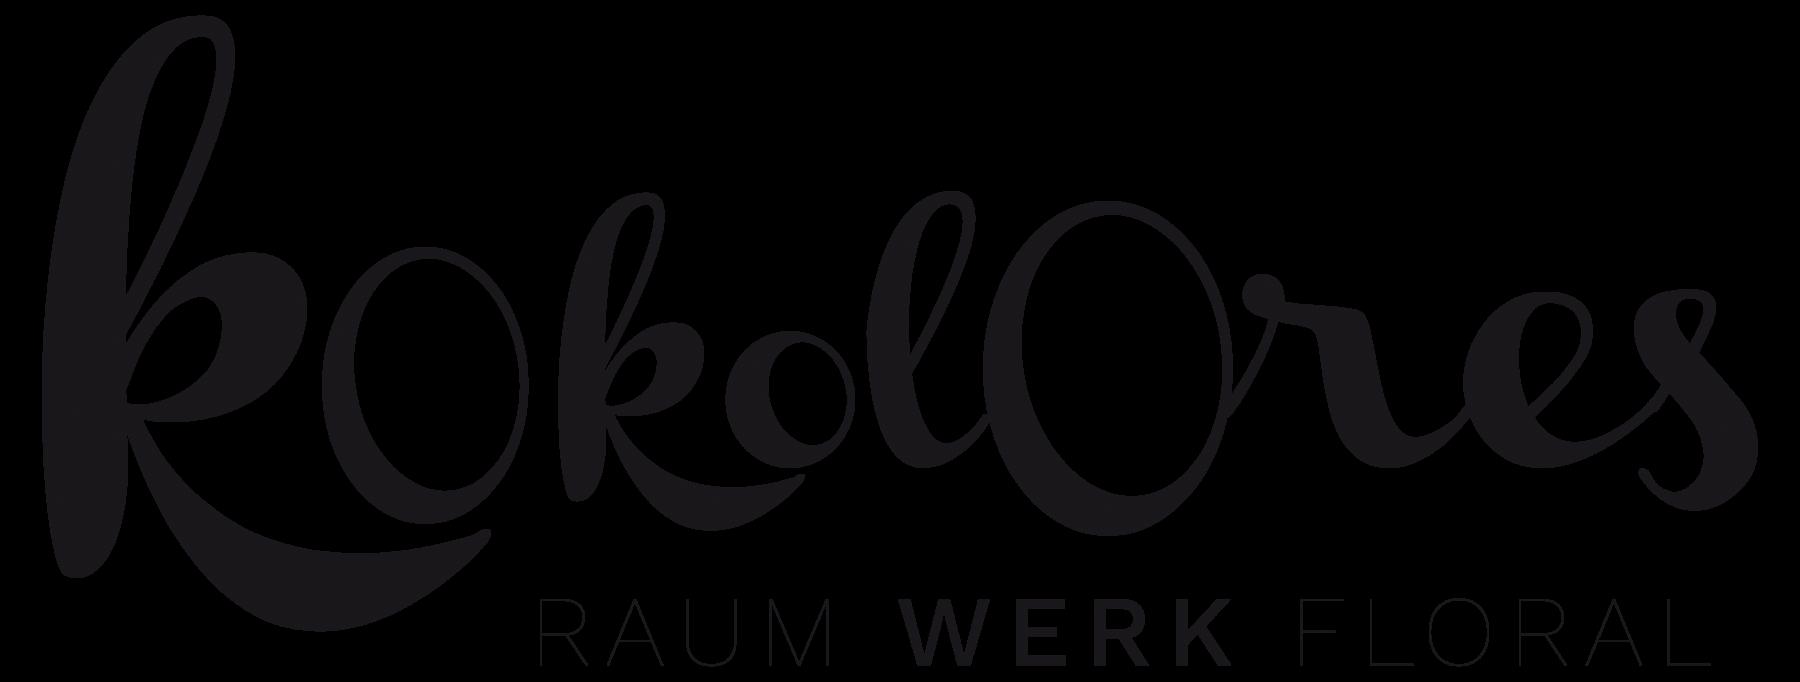 Logo_Kokolores_print_70cm